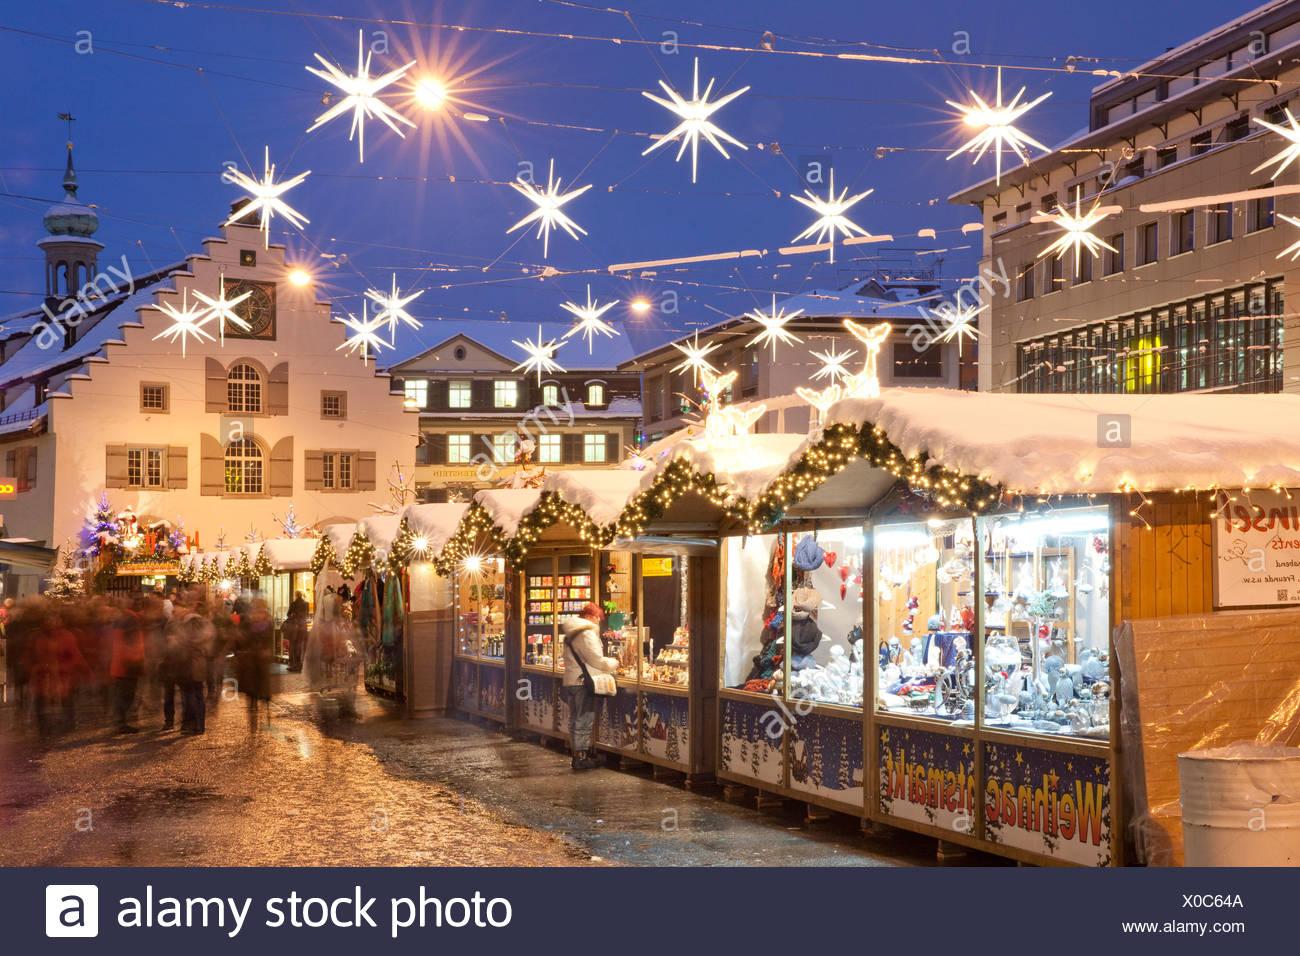 Switzerland Europe night dark Christmas Advent canton SG St. Gallen St. Gall market Christmas fair evening lights winter - Stock Image